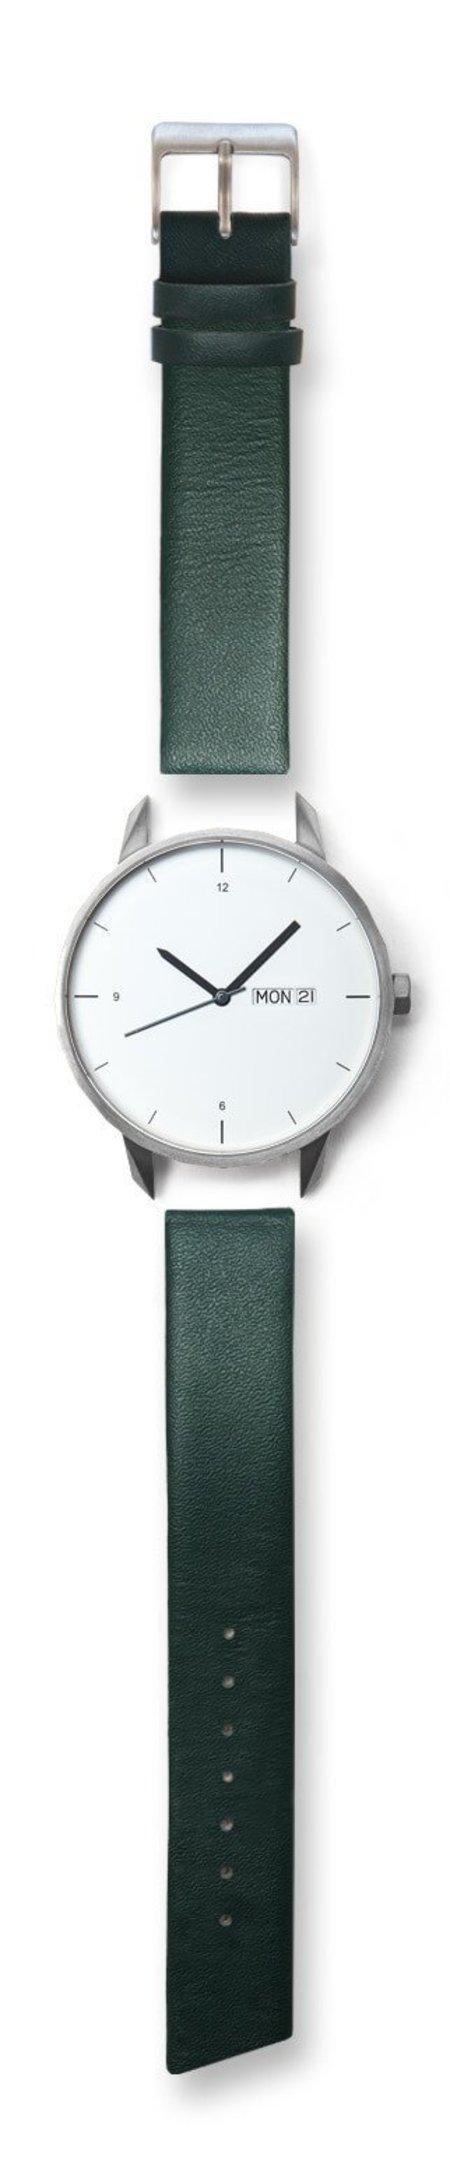 Unisex Tinker Watches Standard Strap 42mm Watch - Silver/Green